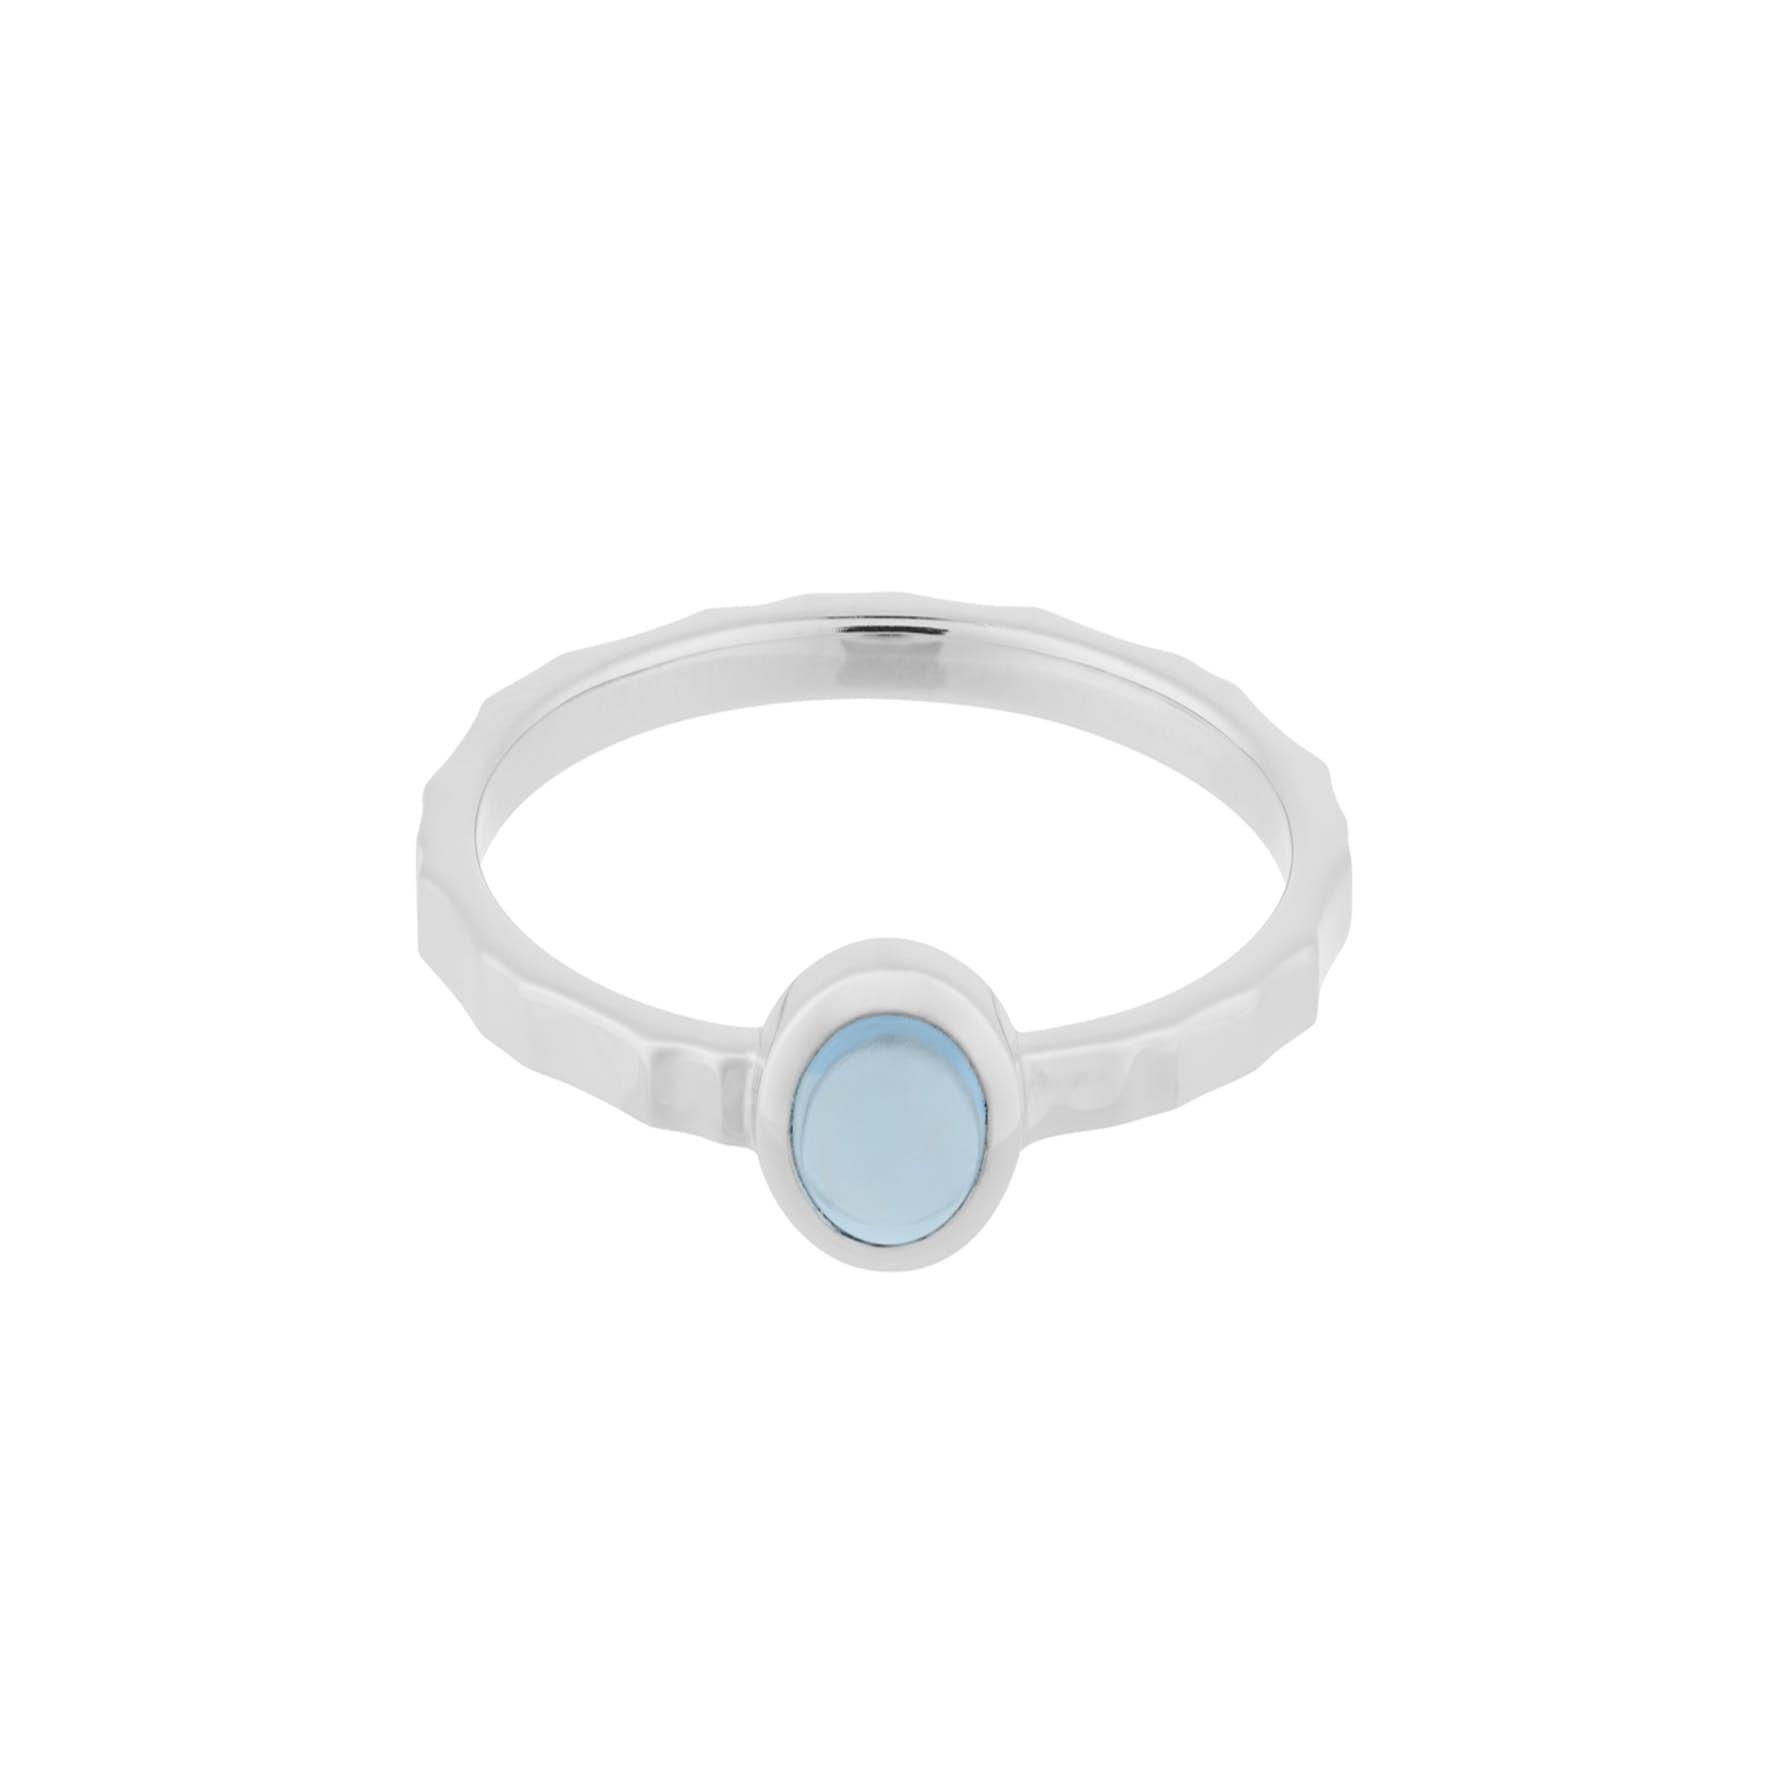 Shine Blue Ring von Pernille Corydon in Silber Sterling 925